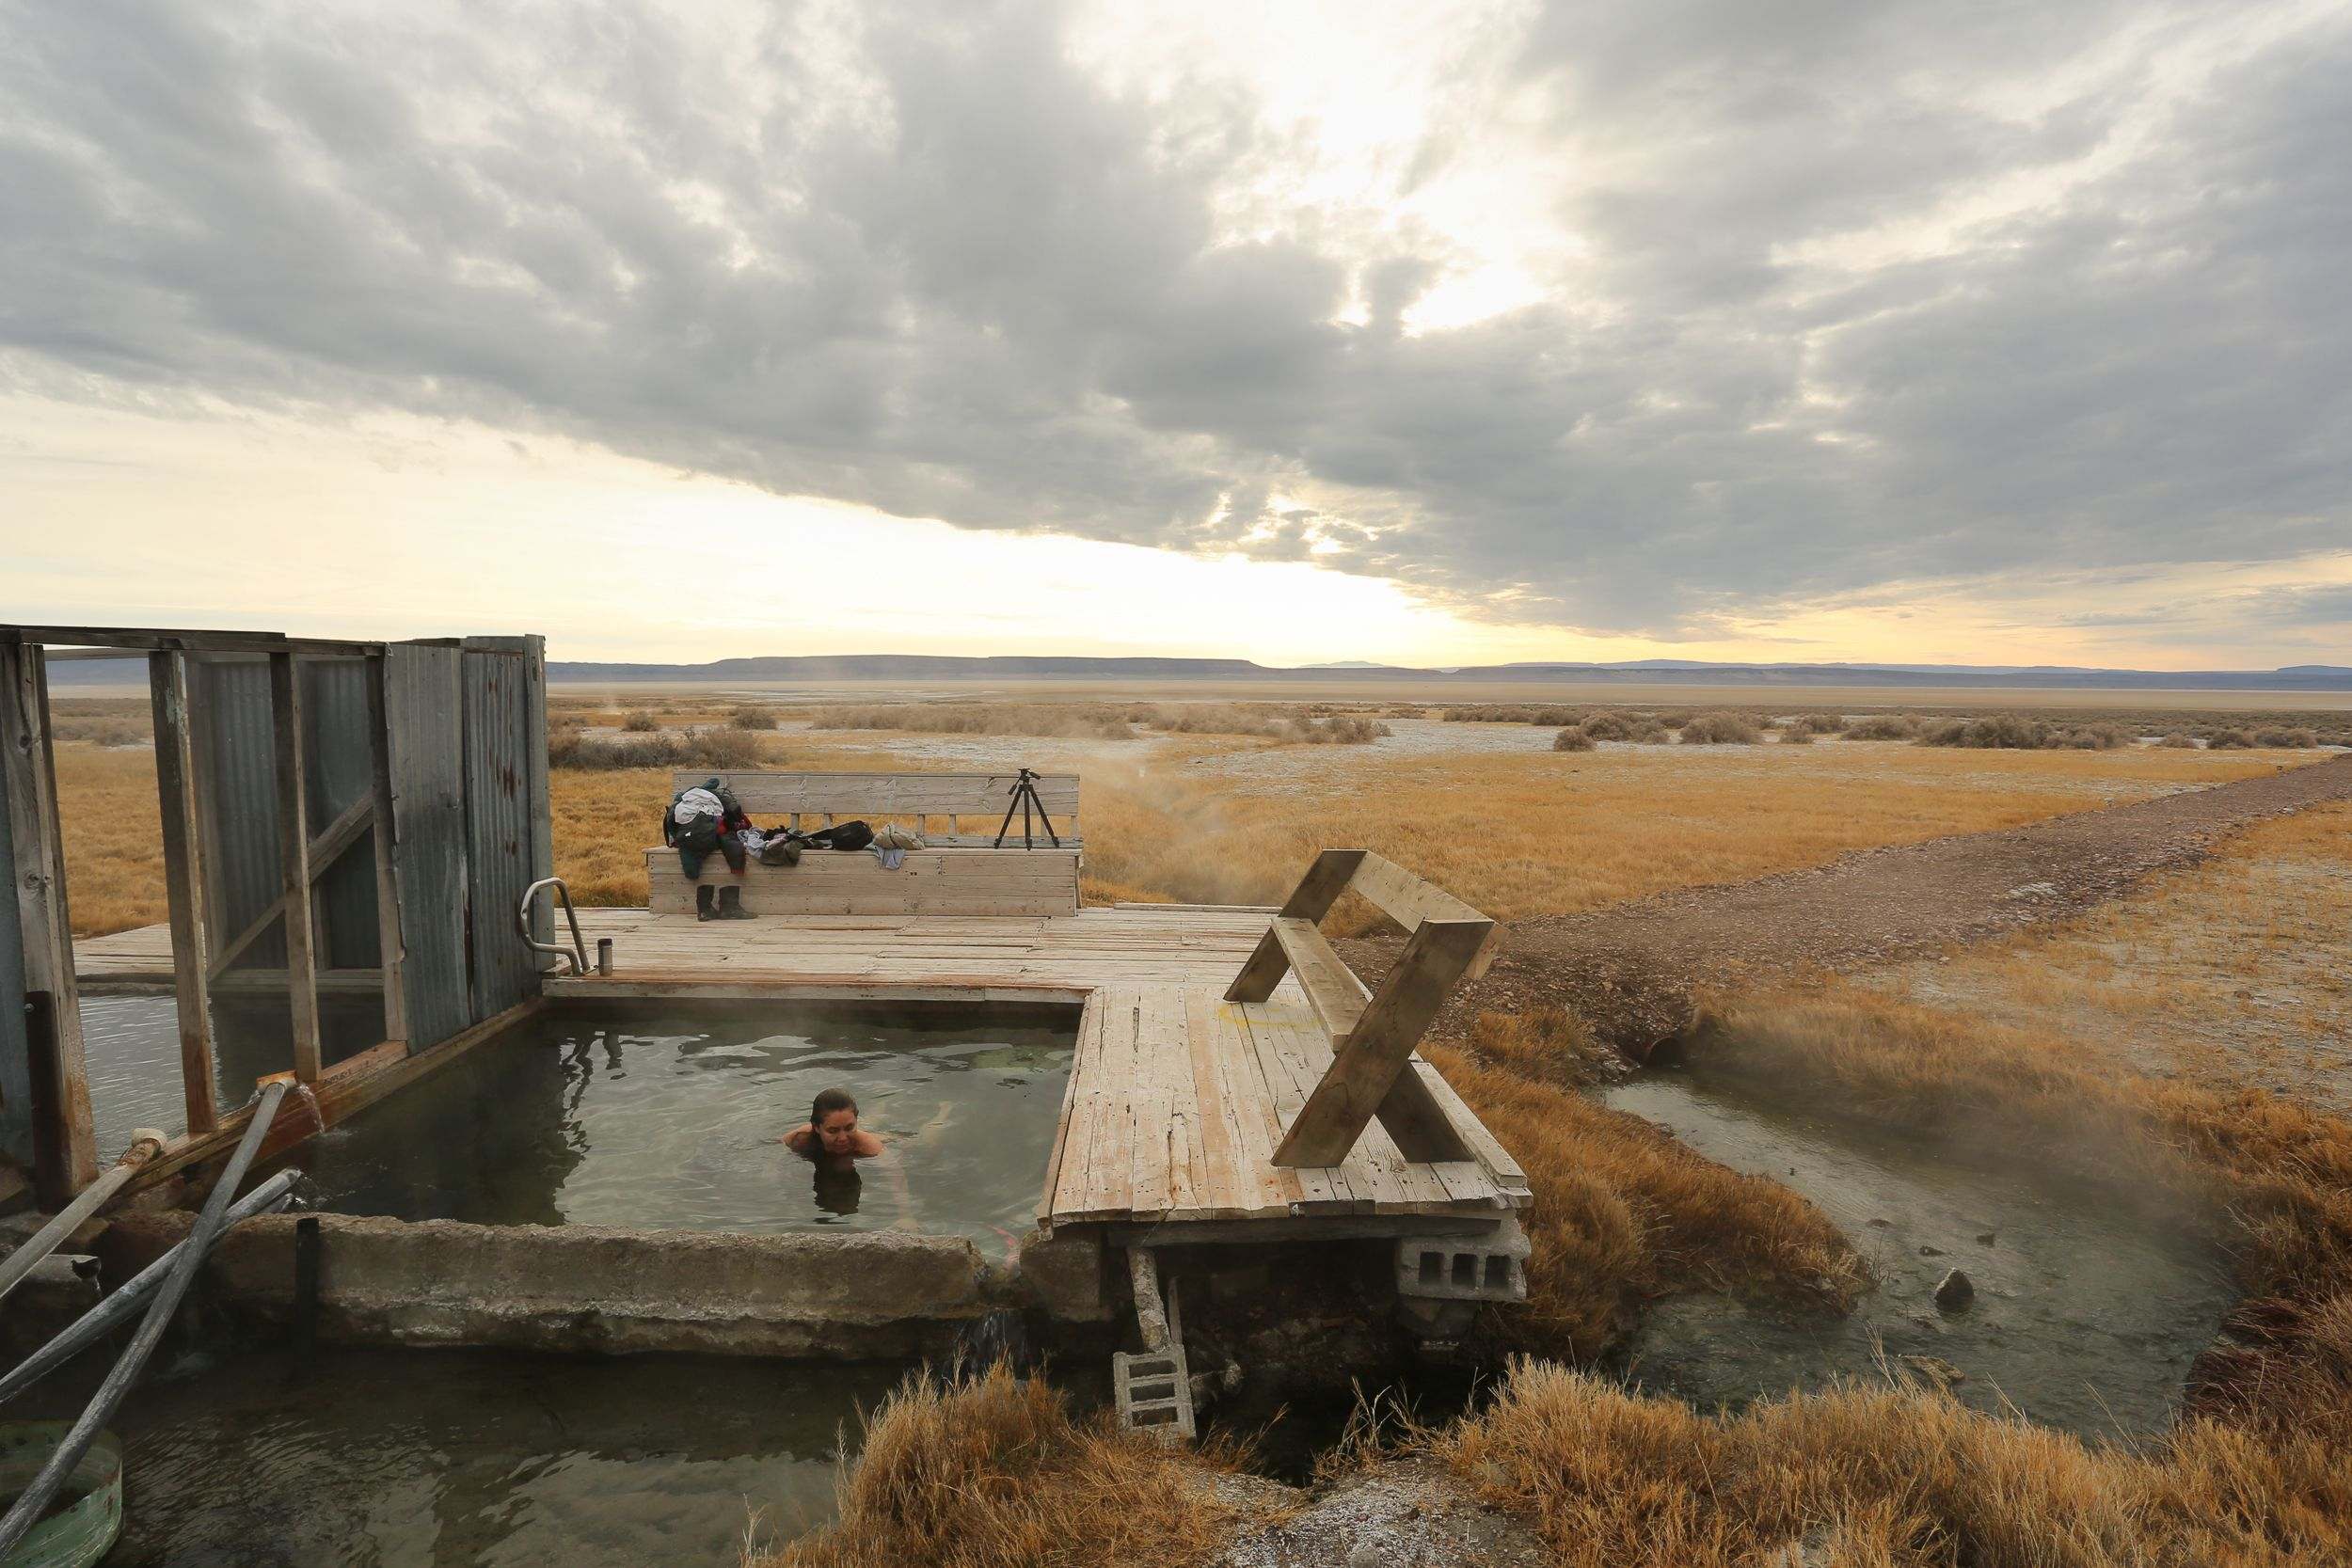 Hot springs of Oregon | Great american road trip, Hot springs, Oregon  camping